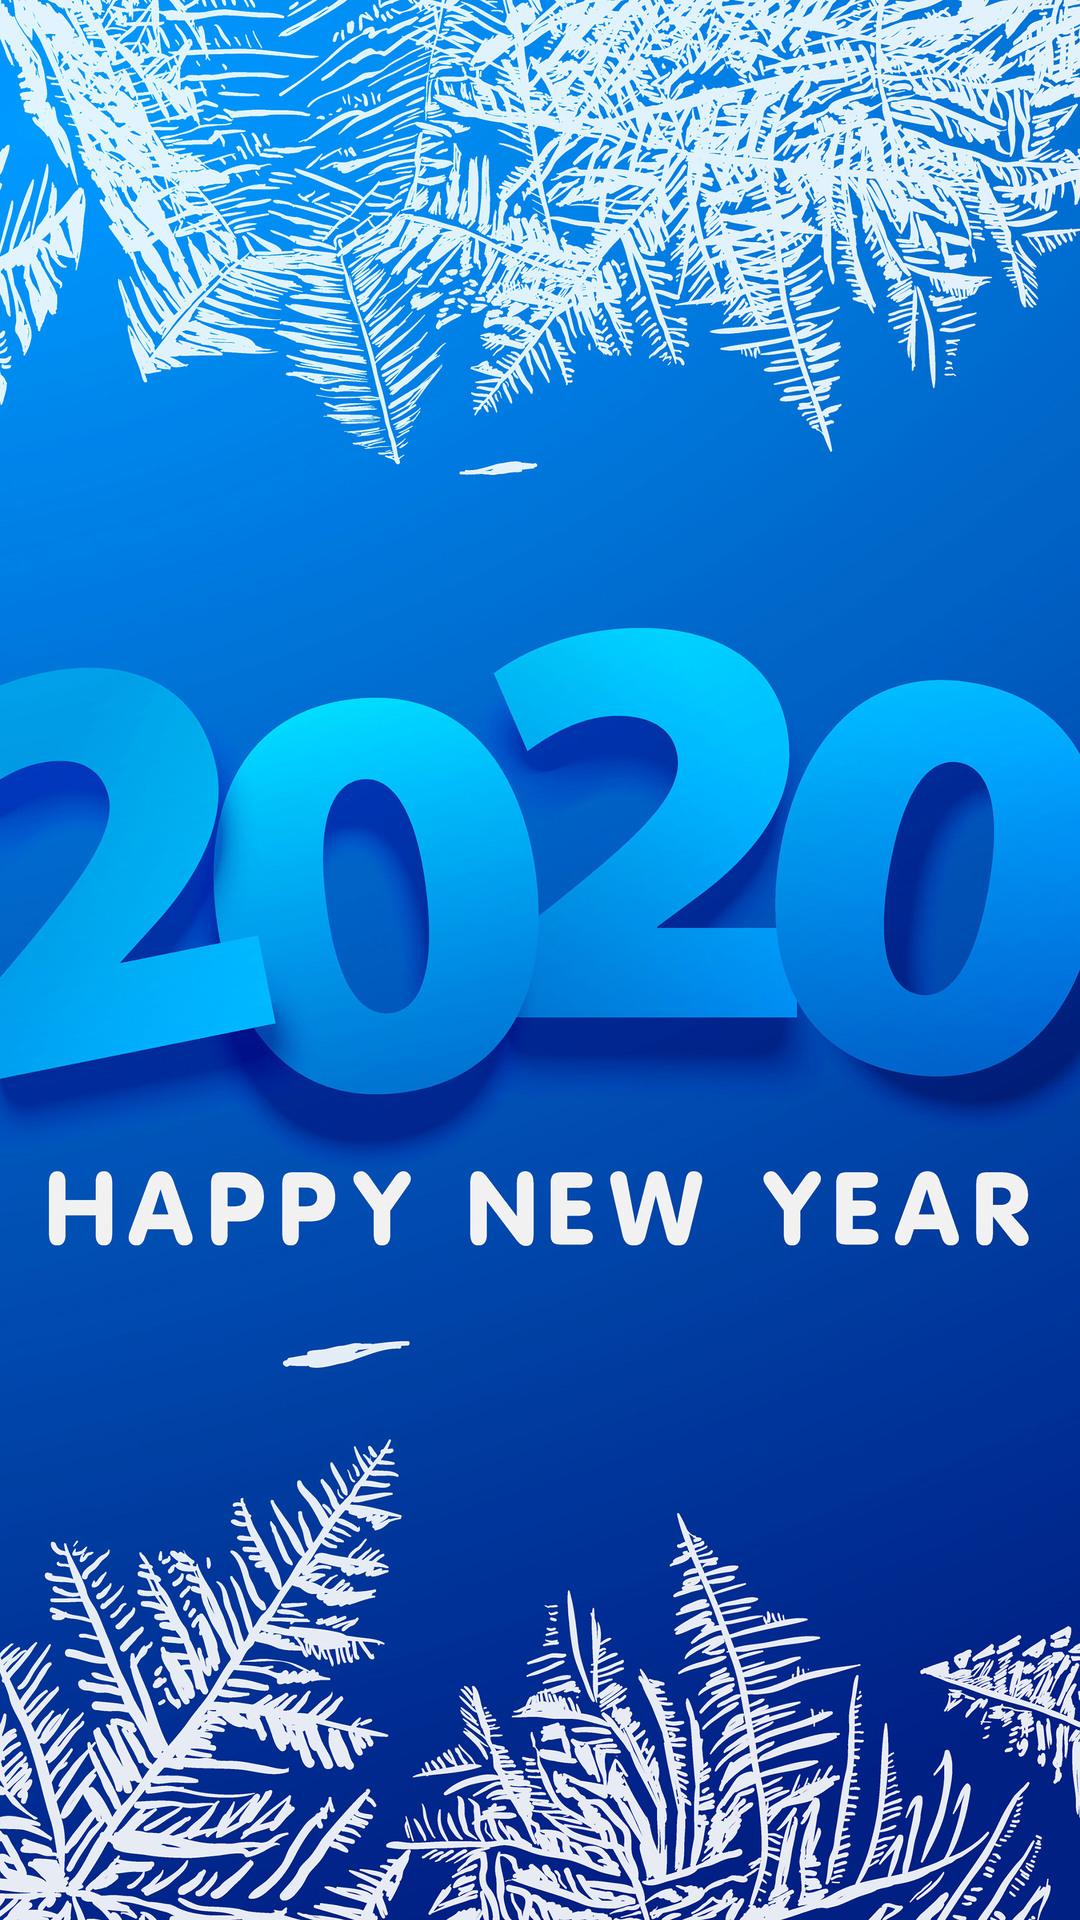 2020 Happy New Year 8K Wallpaper 42309 1080x1920